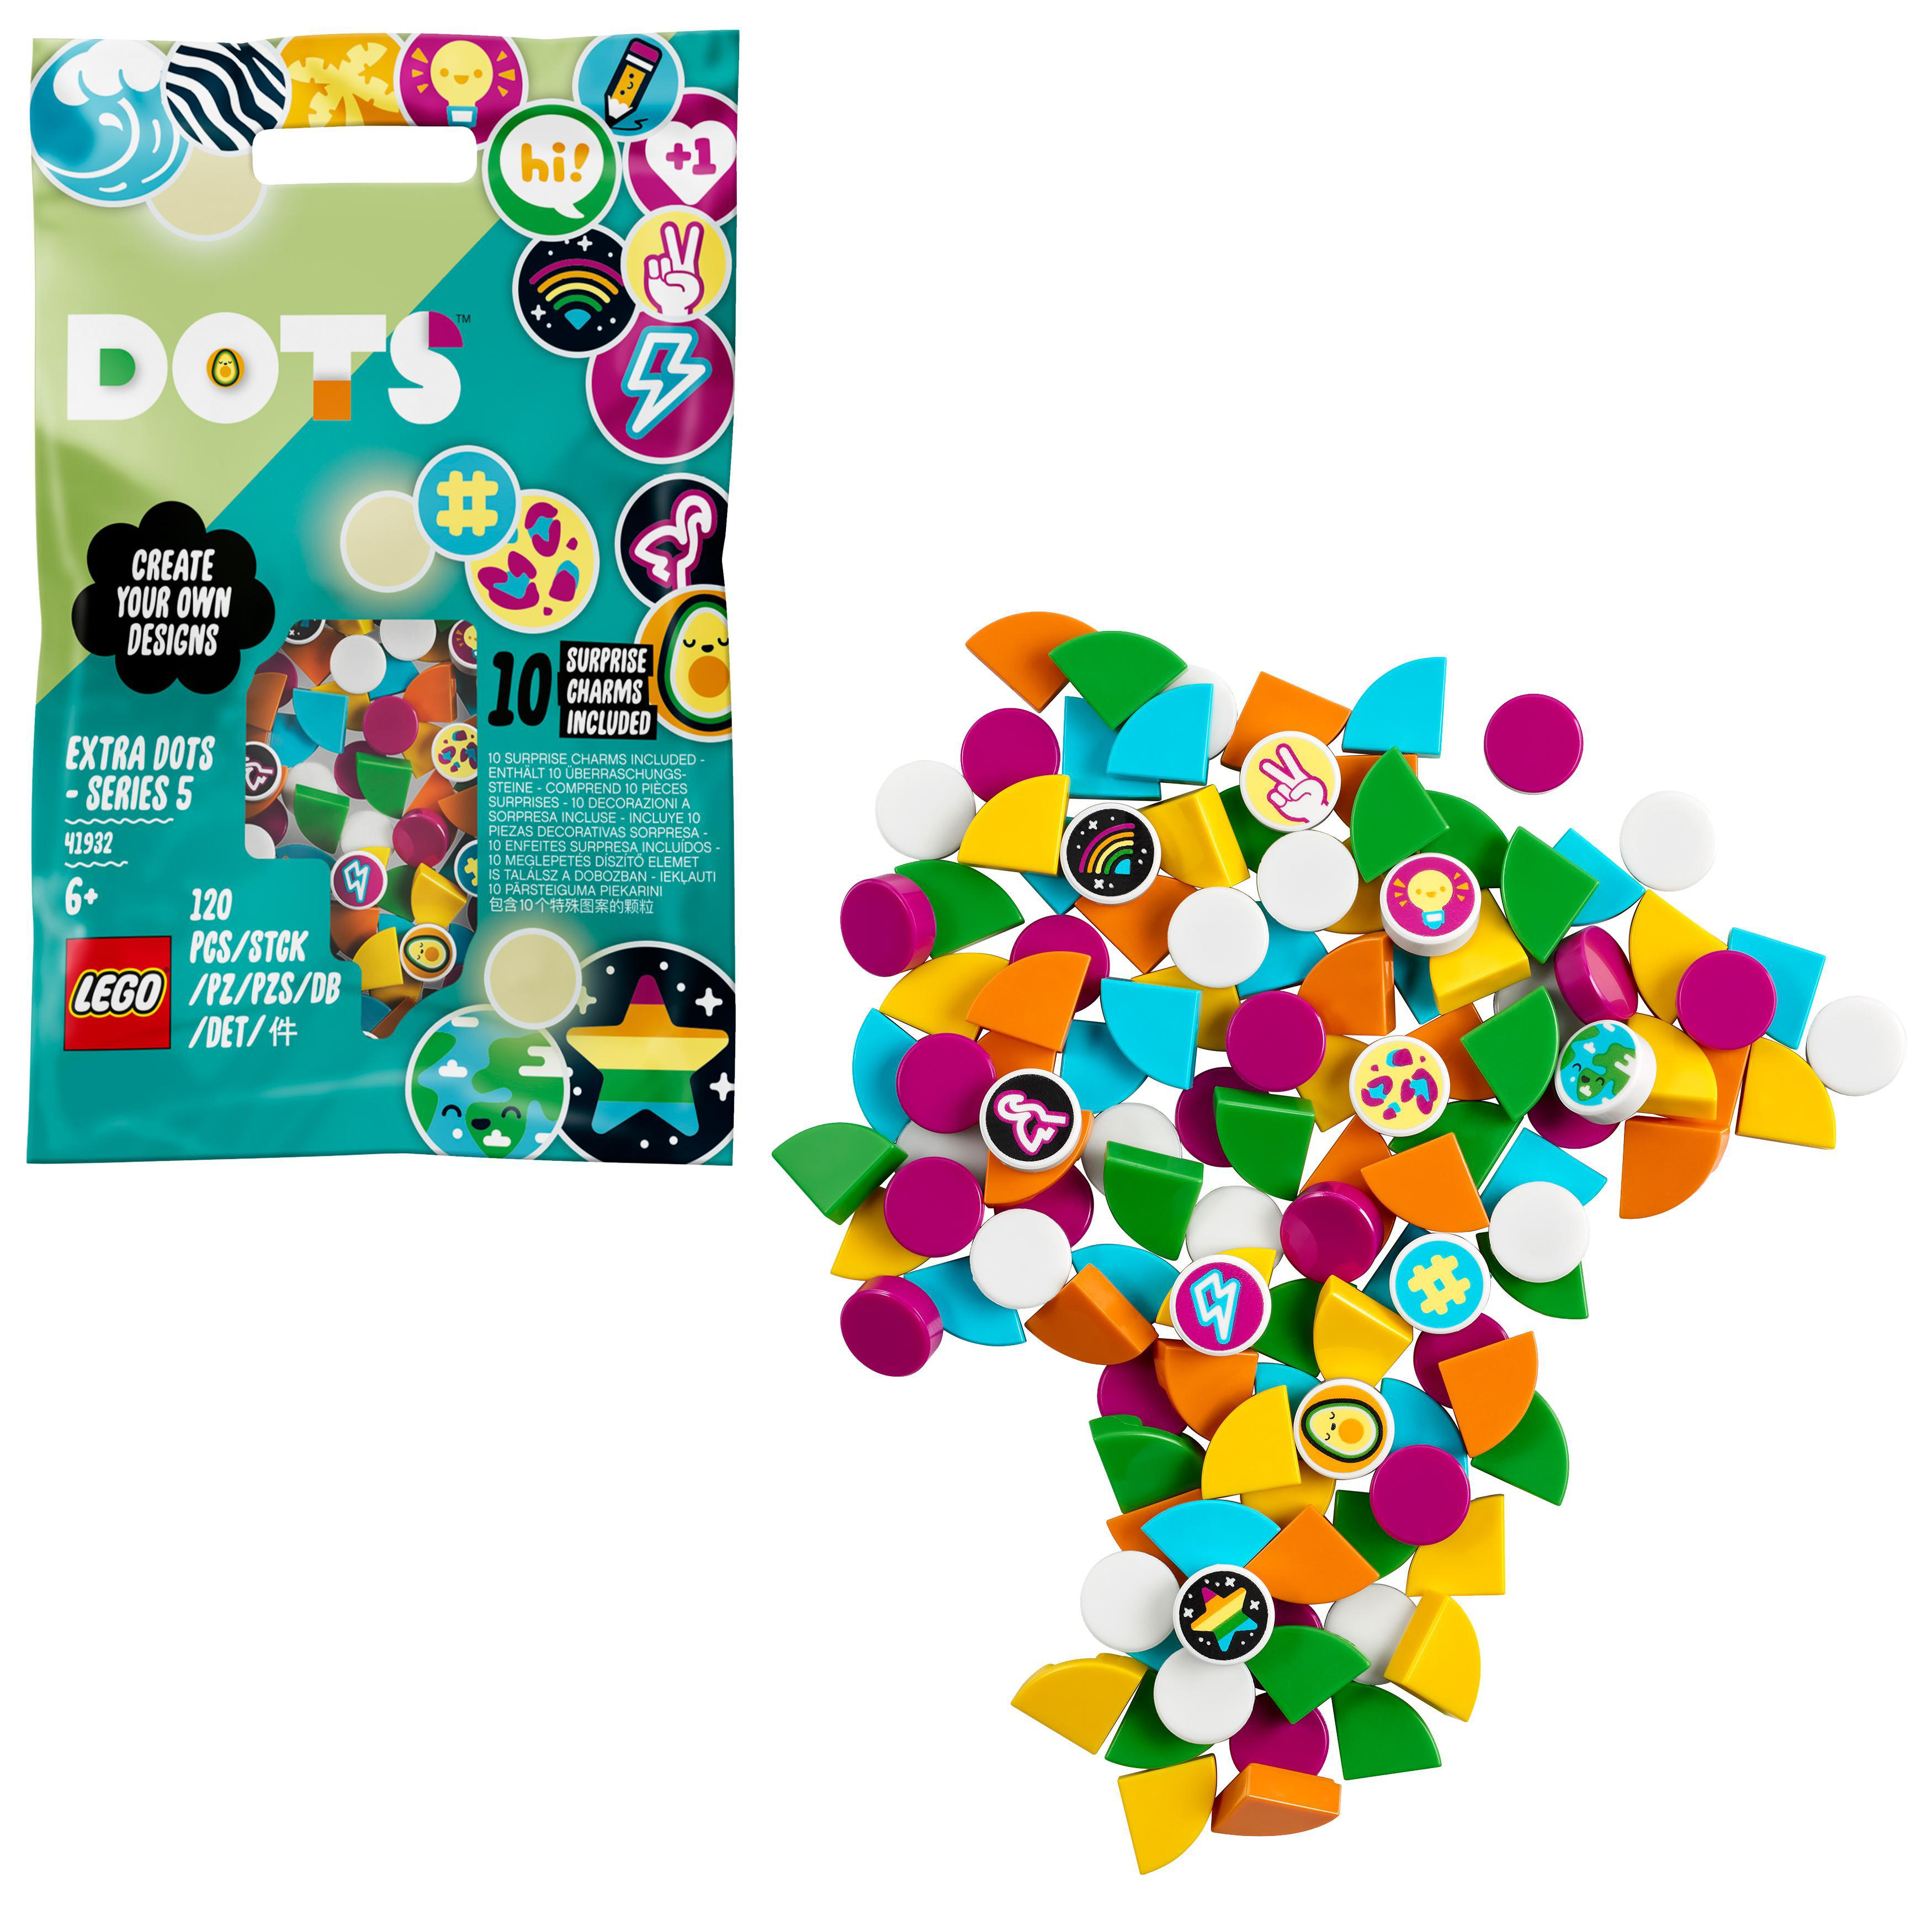 LEGO DOTS - Extra DOTS - Series 5 (41932)